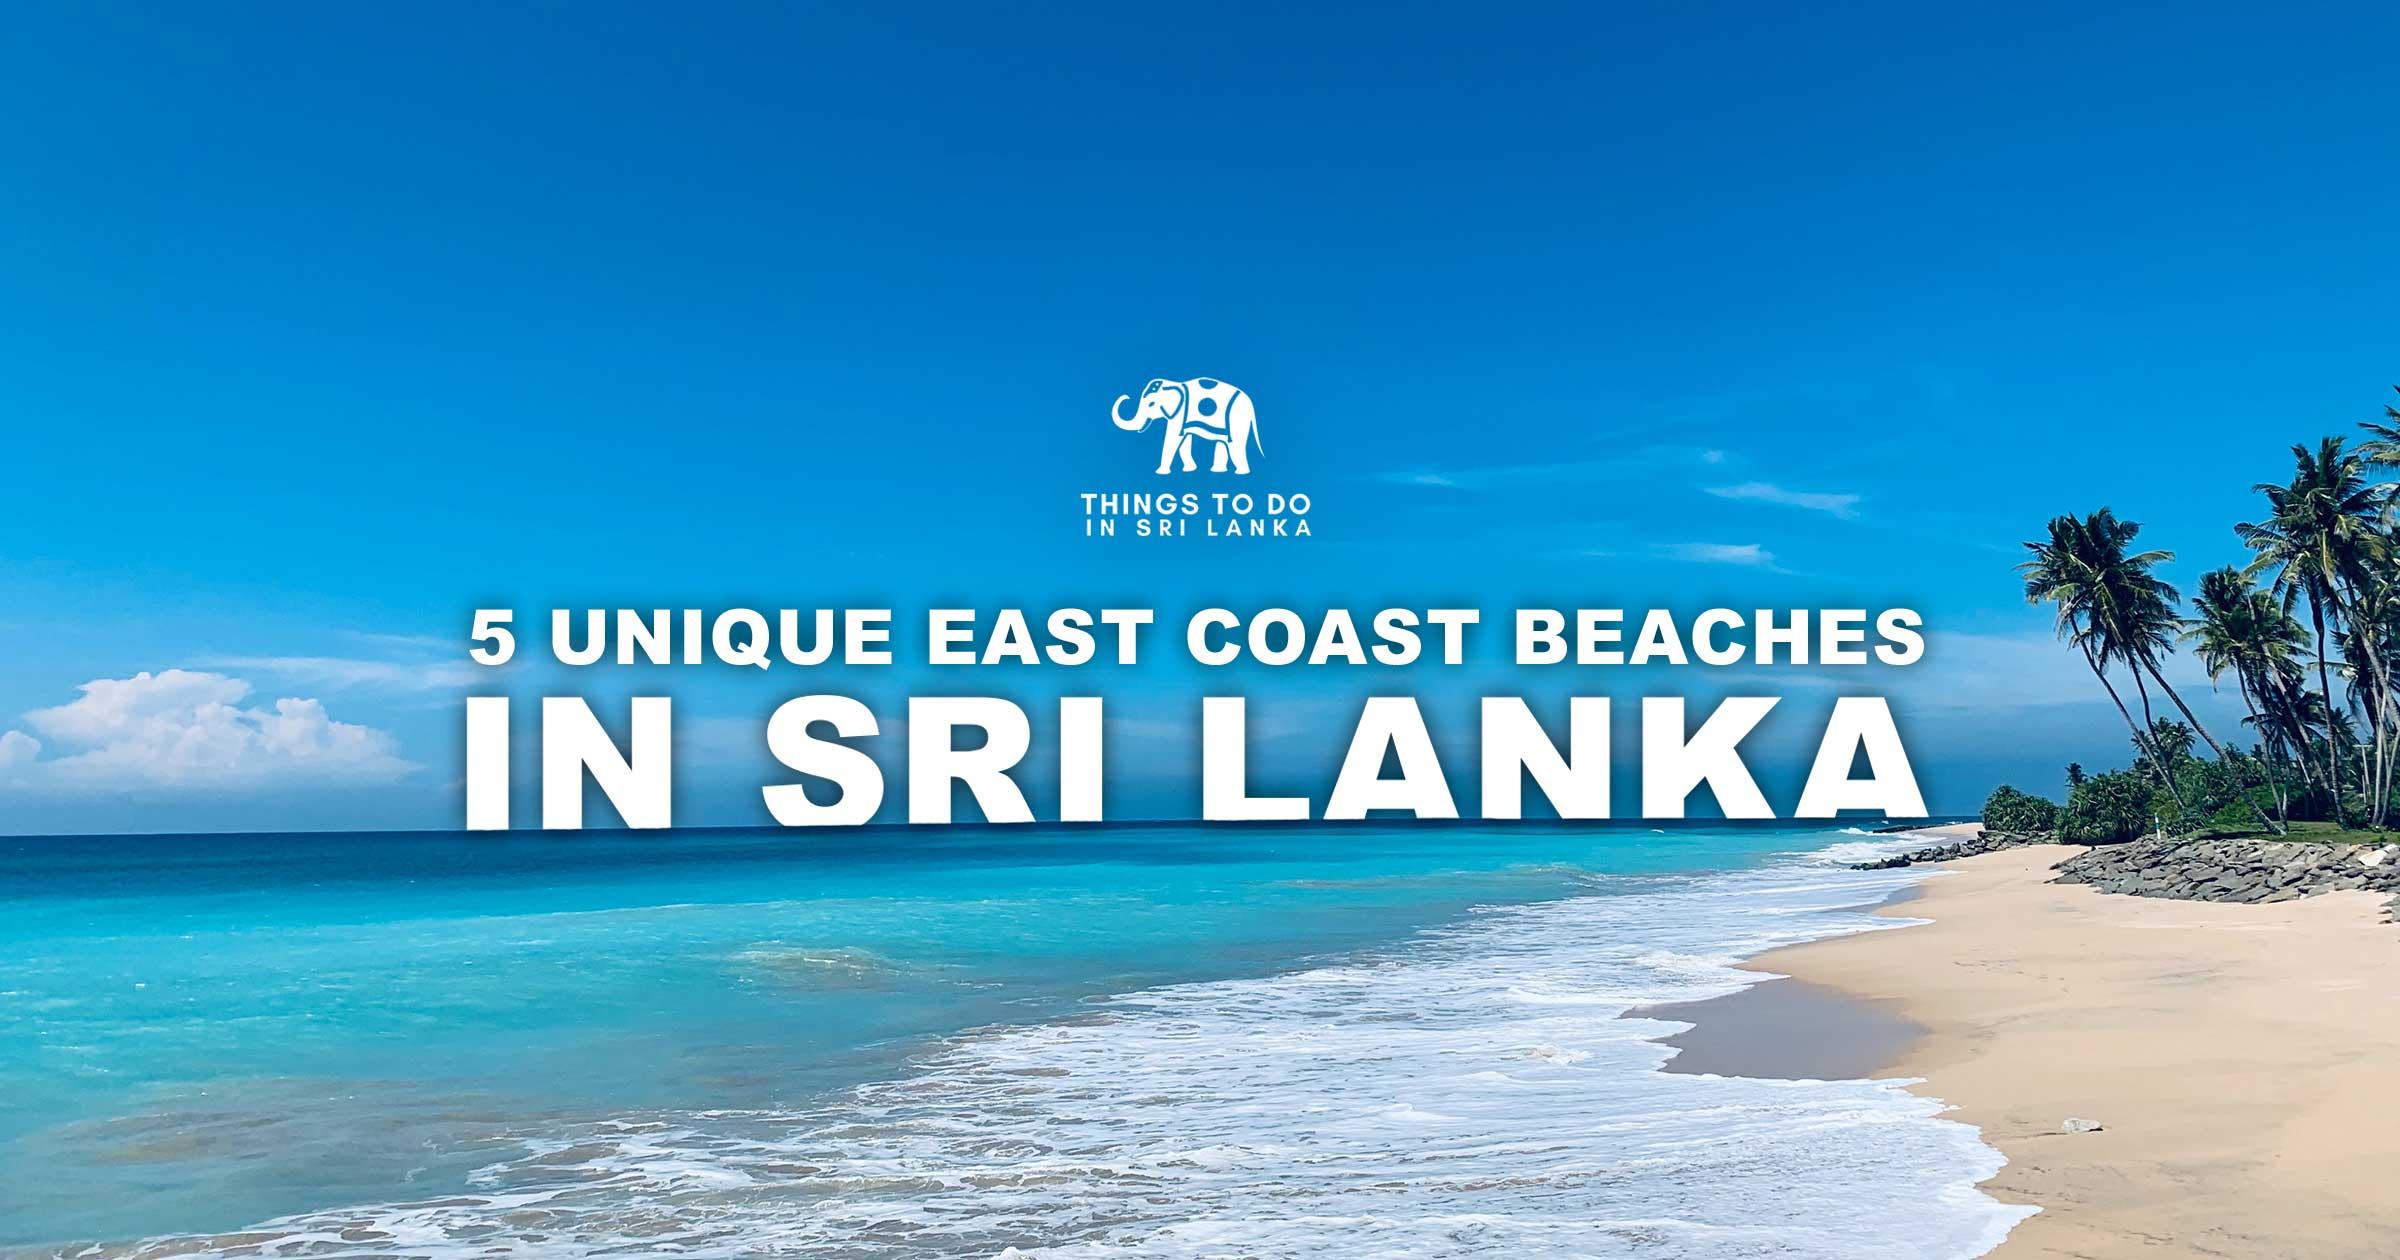 5 Unique East Coast Beaches in Sri Lanka